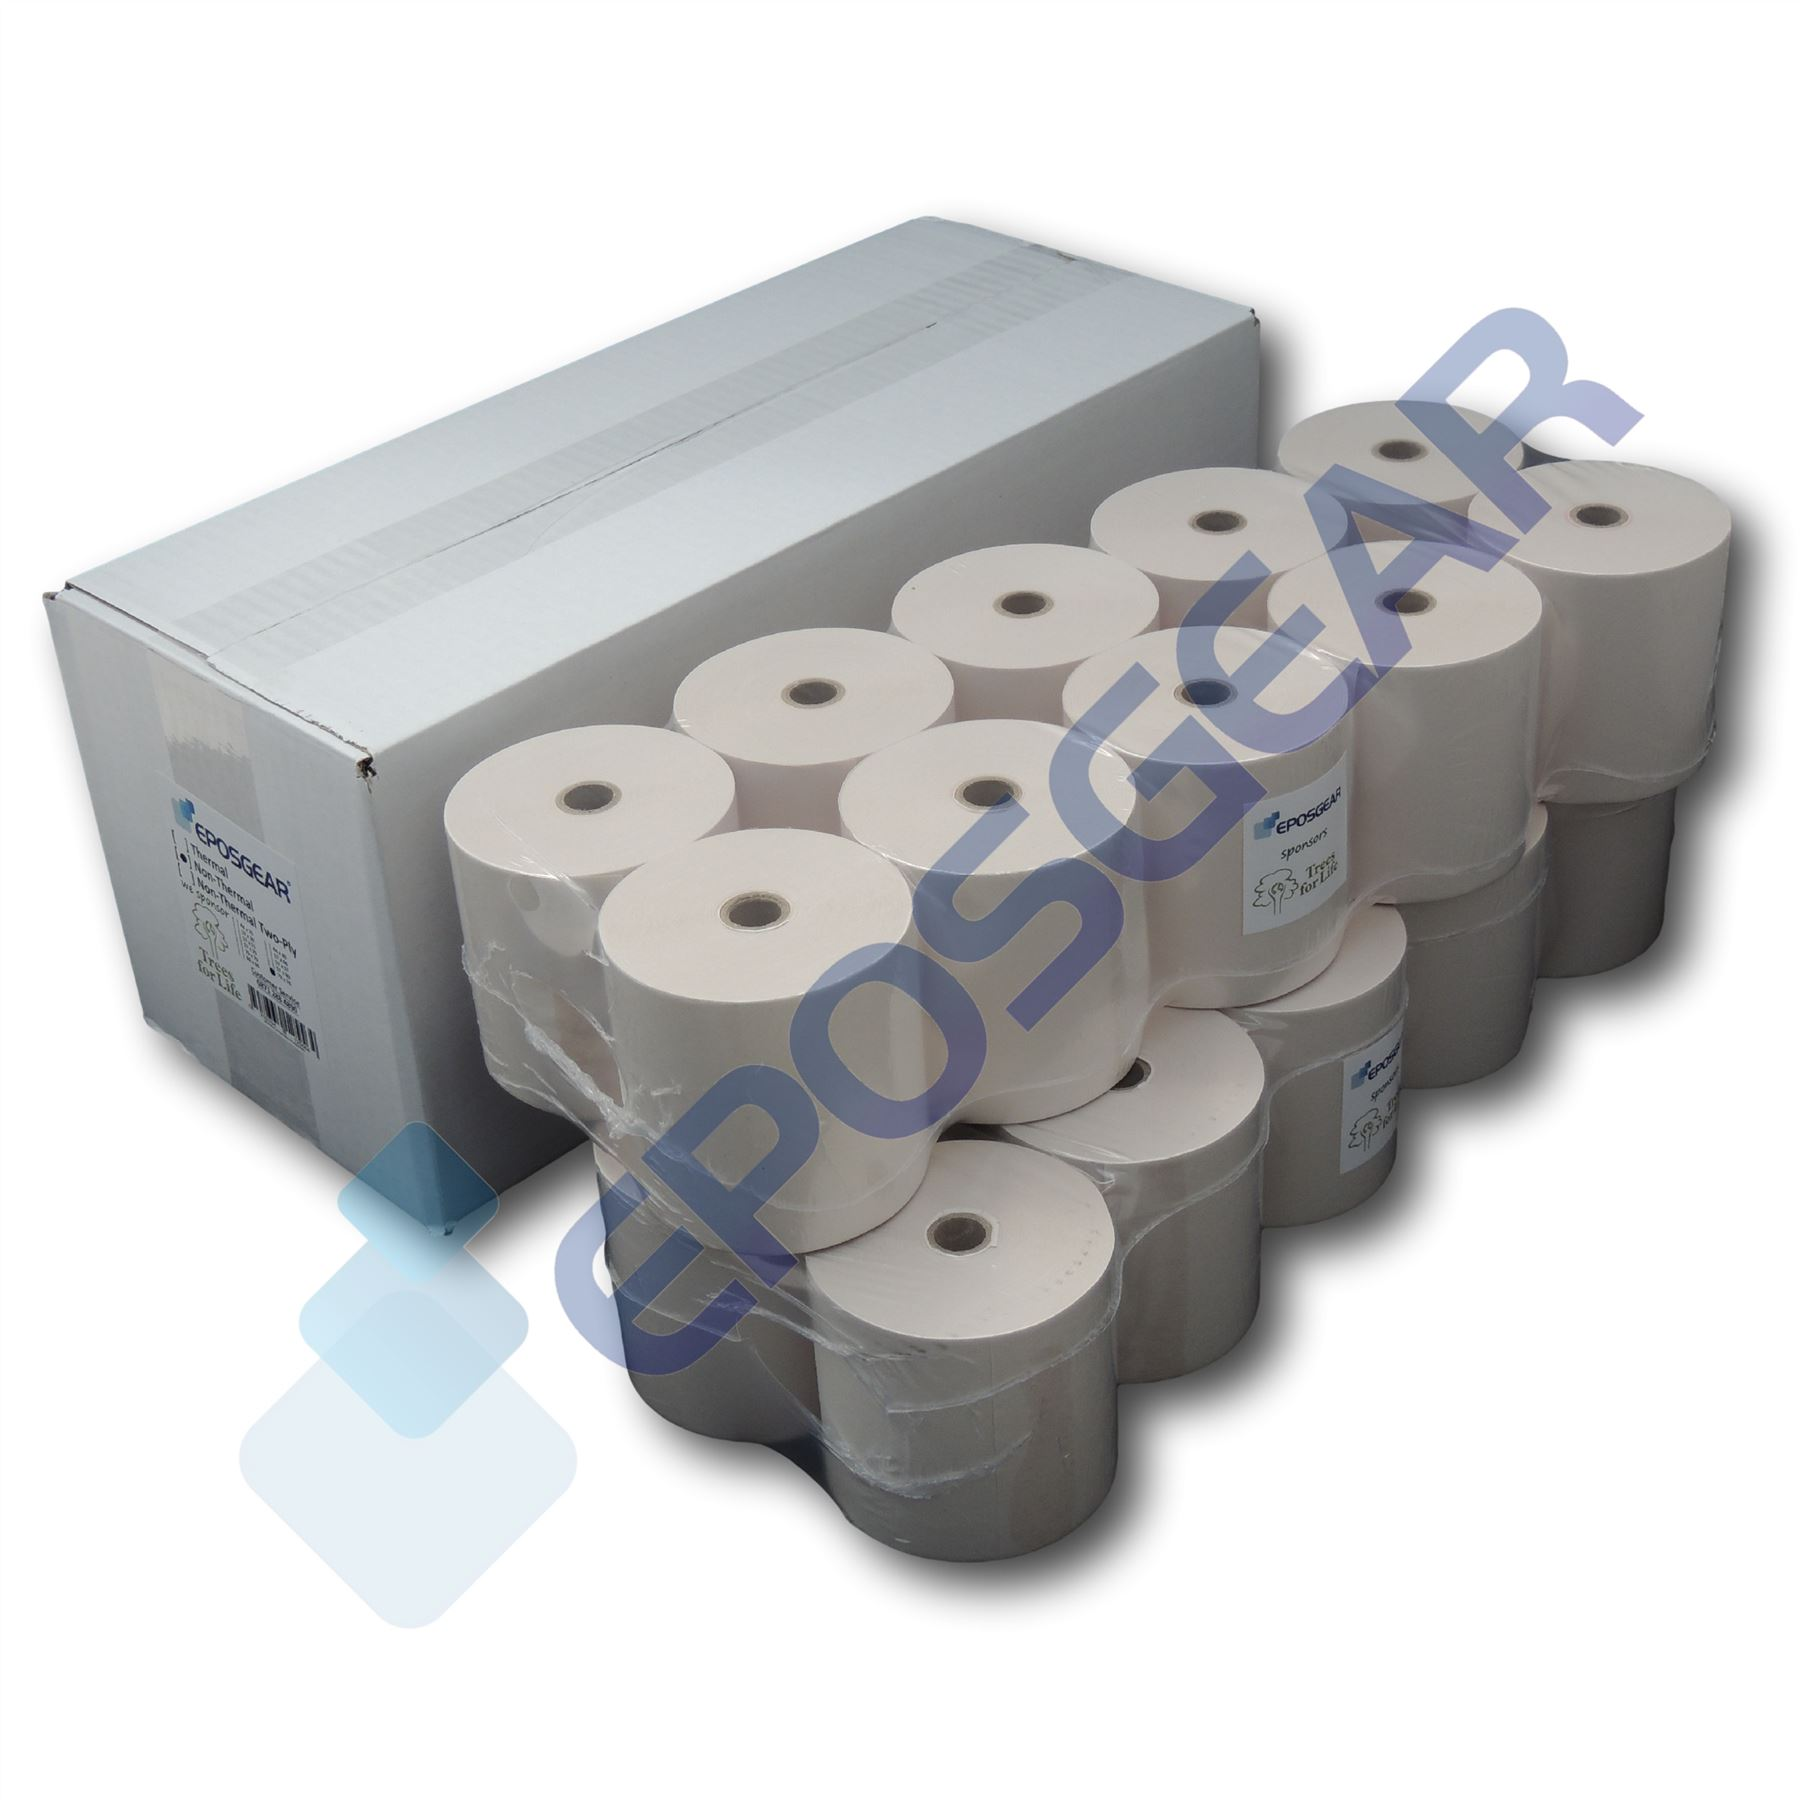 epson kitchen printer refurbish cabinets m119b m119d m188b single ply paper till epos